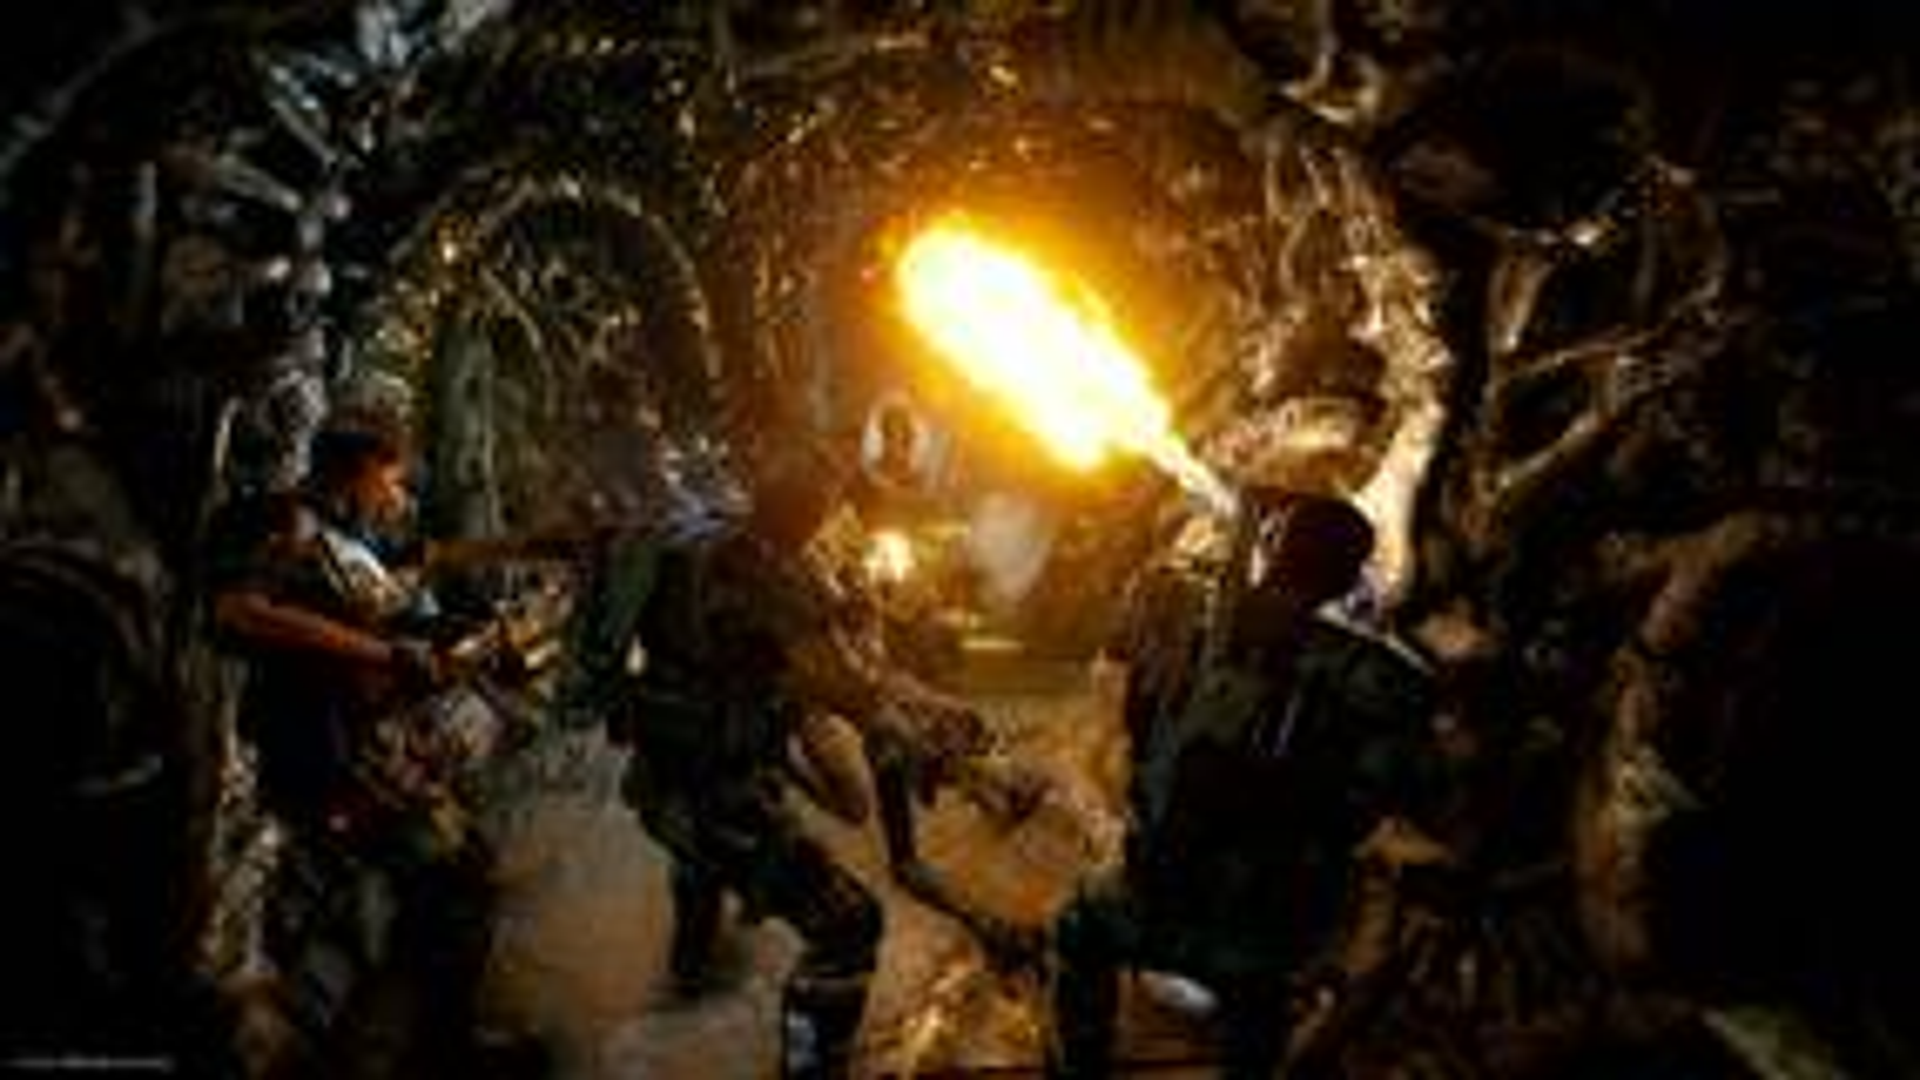 Image for No cross-play in co-op shooter Aliens: Fireteam Elite